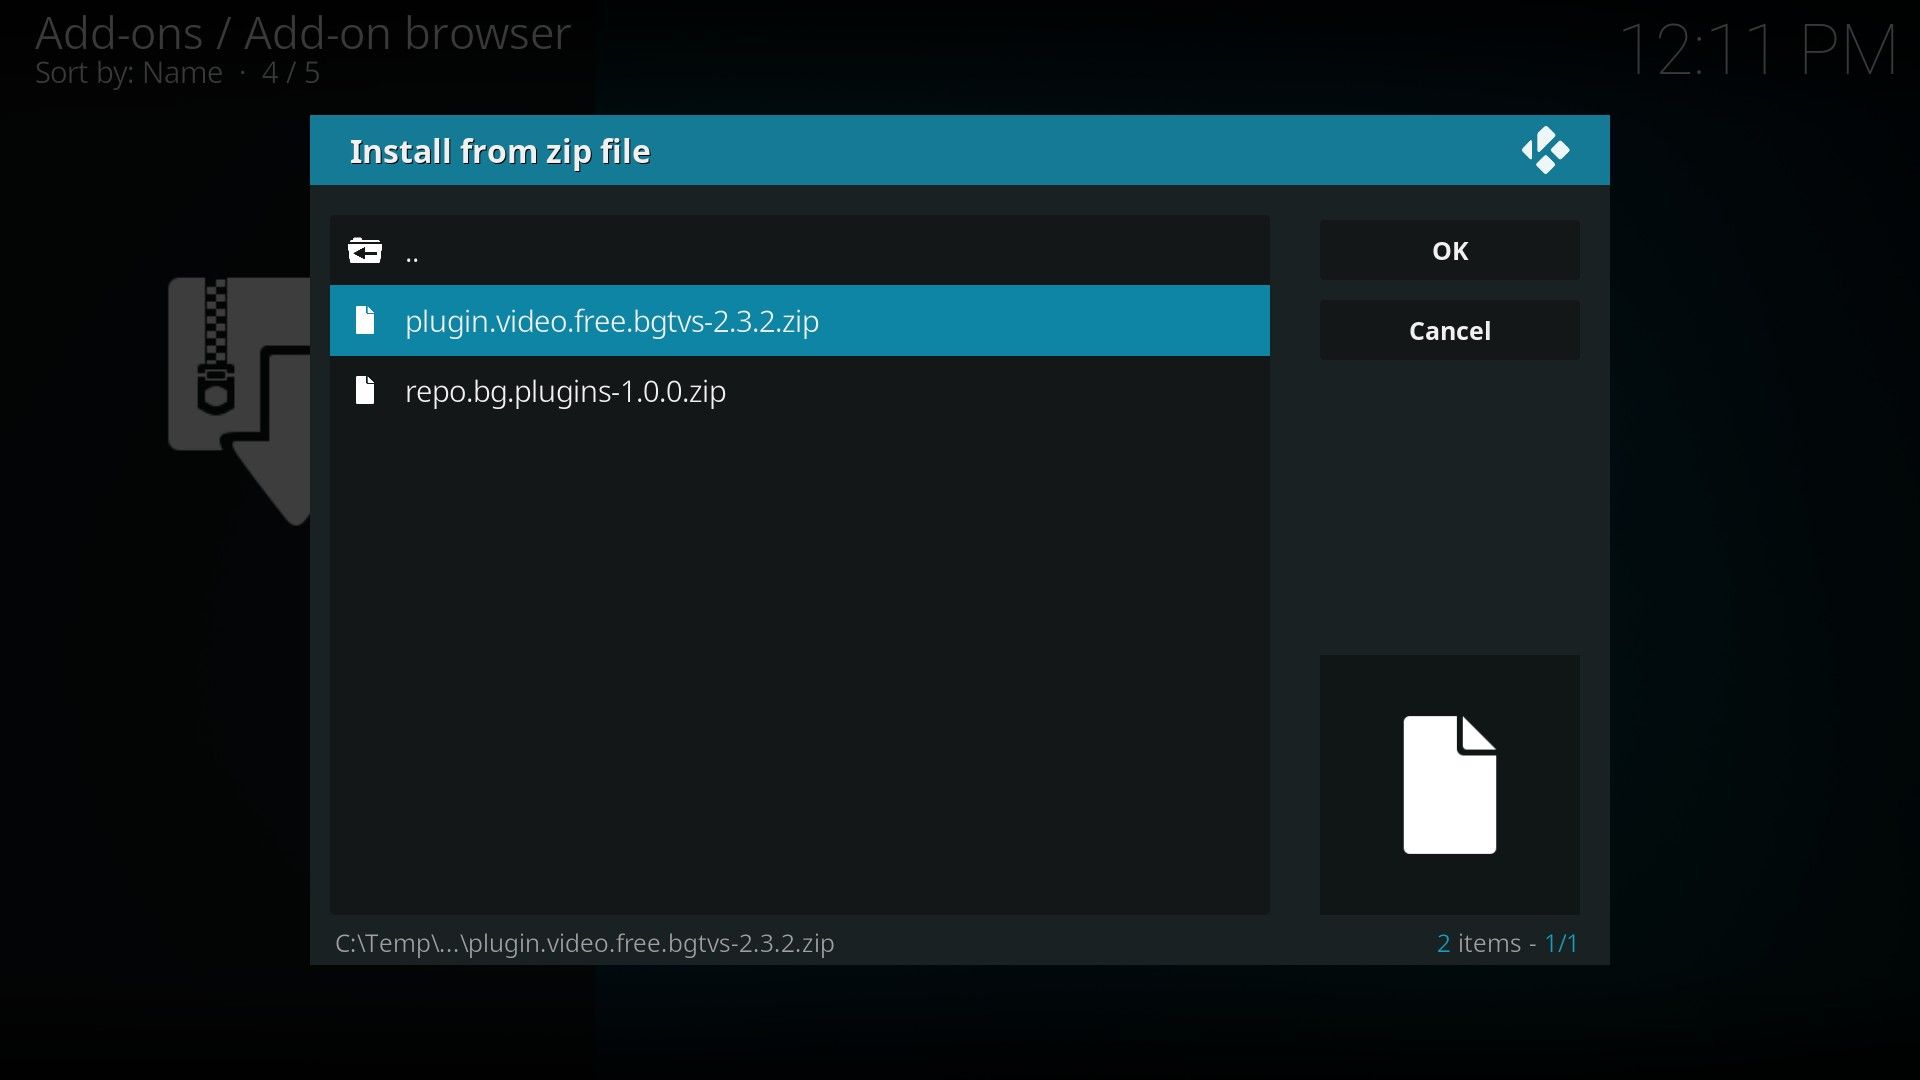 Kodi 17.4 Krypton - plugin.video.free.bgtvs-2.3.2.zip